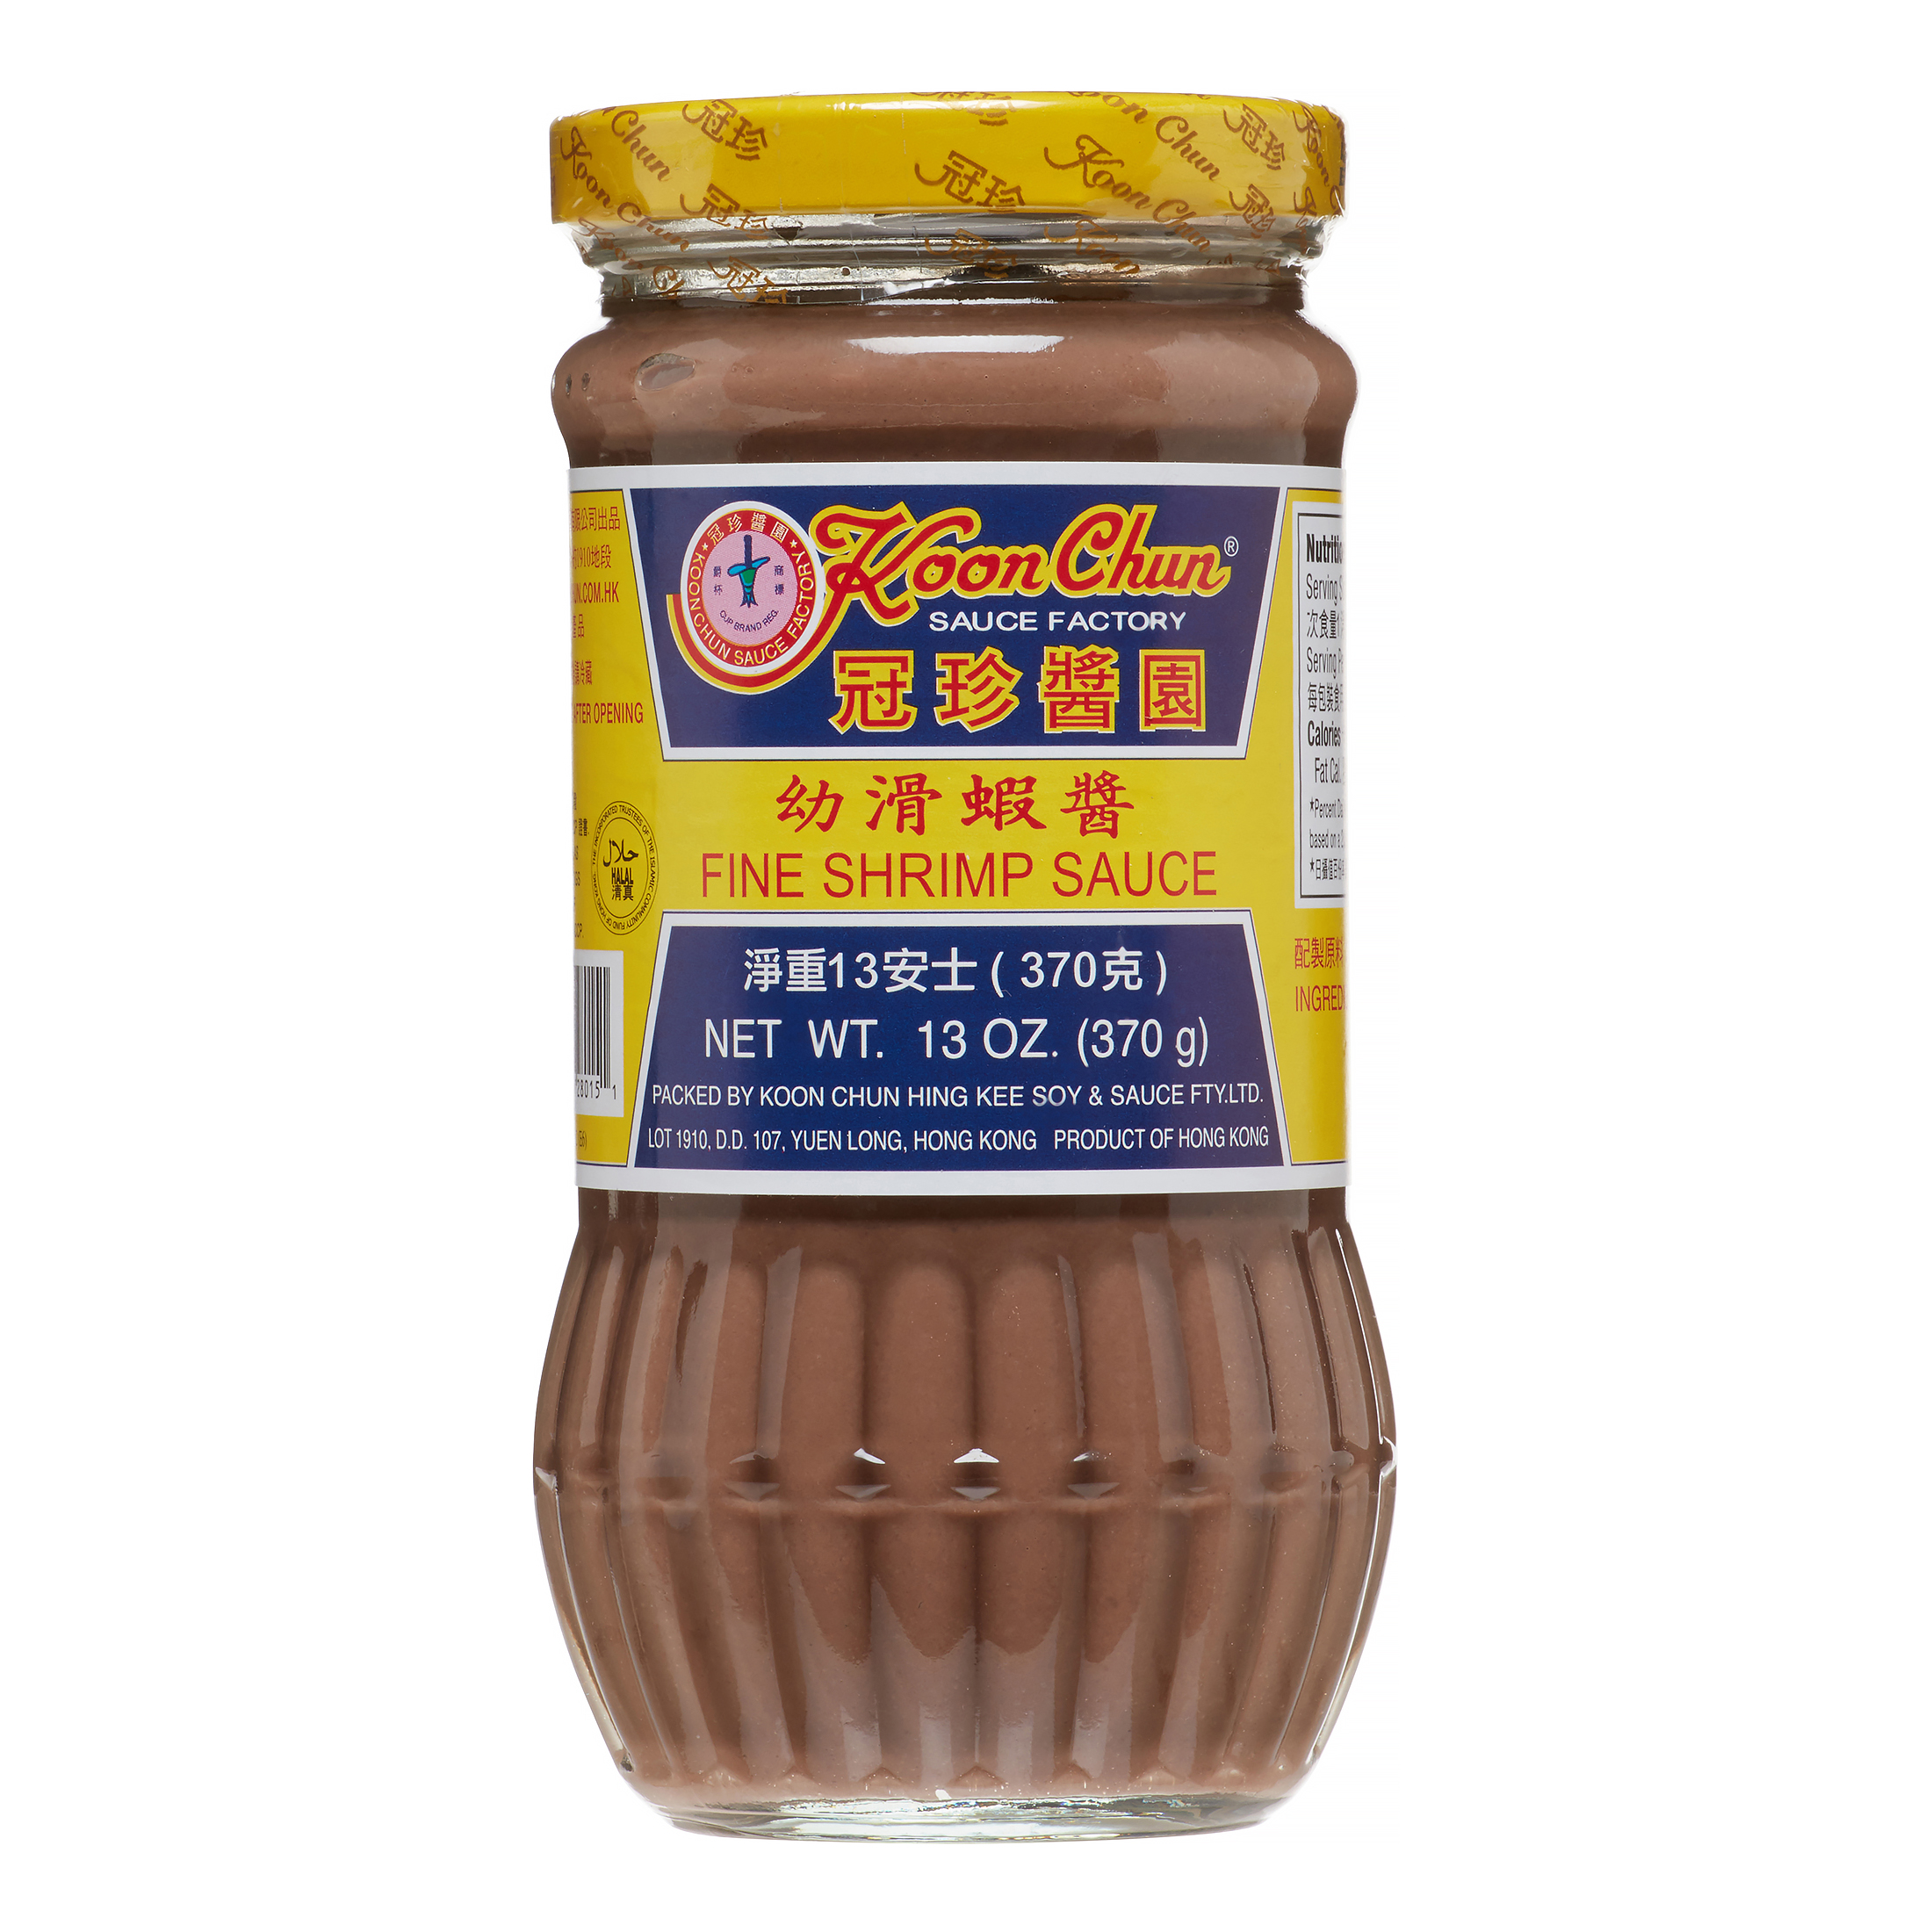 Koon Chun Fine Shrimp Sauce, 13 Oz by Koon chun